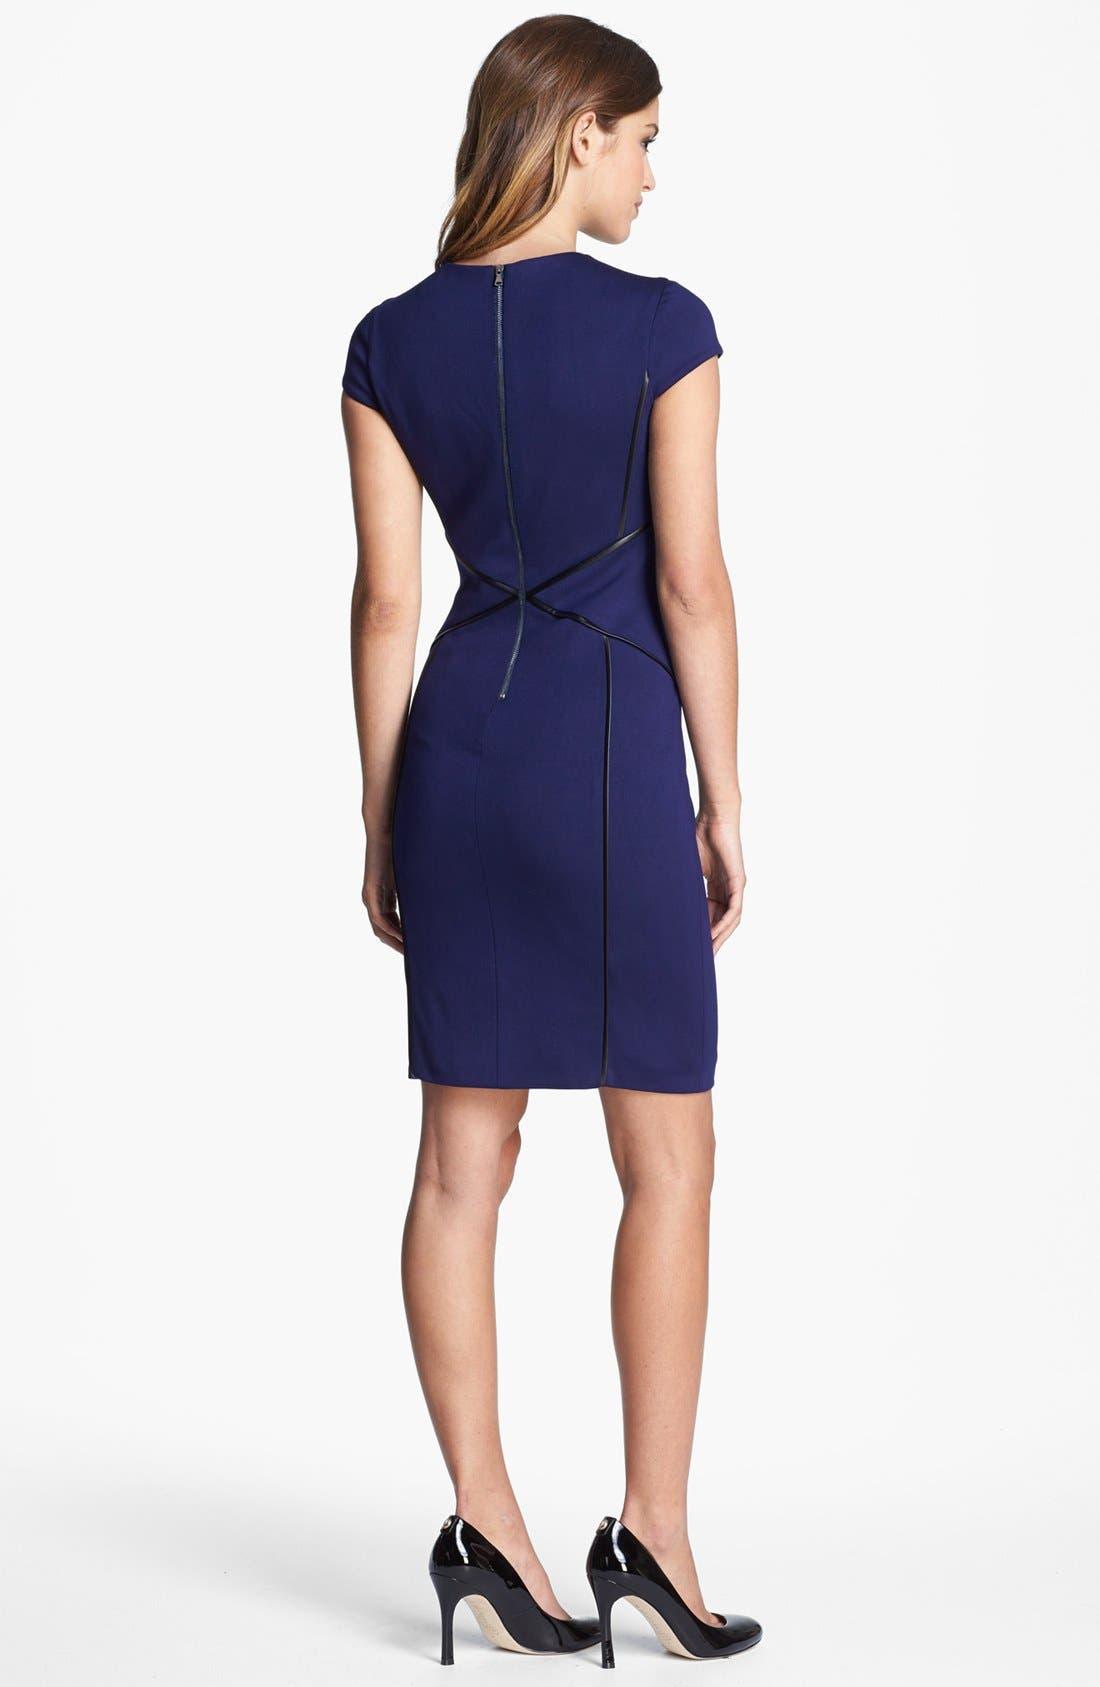 CYNTHIA STEFFE, Cap Sleeve Faux Leather Trim Ponte Sheath Dress, Alternate thumbnail 3, color, 508